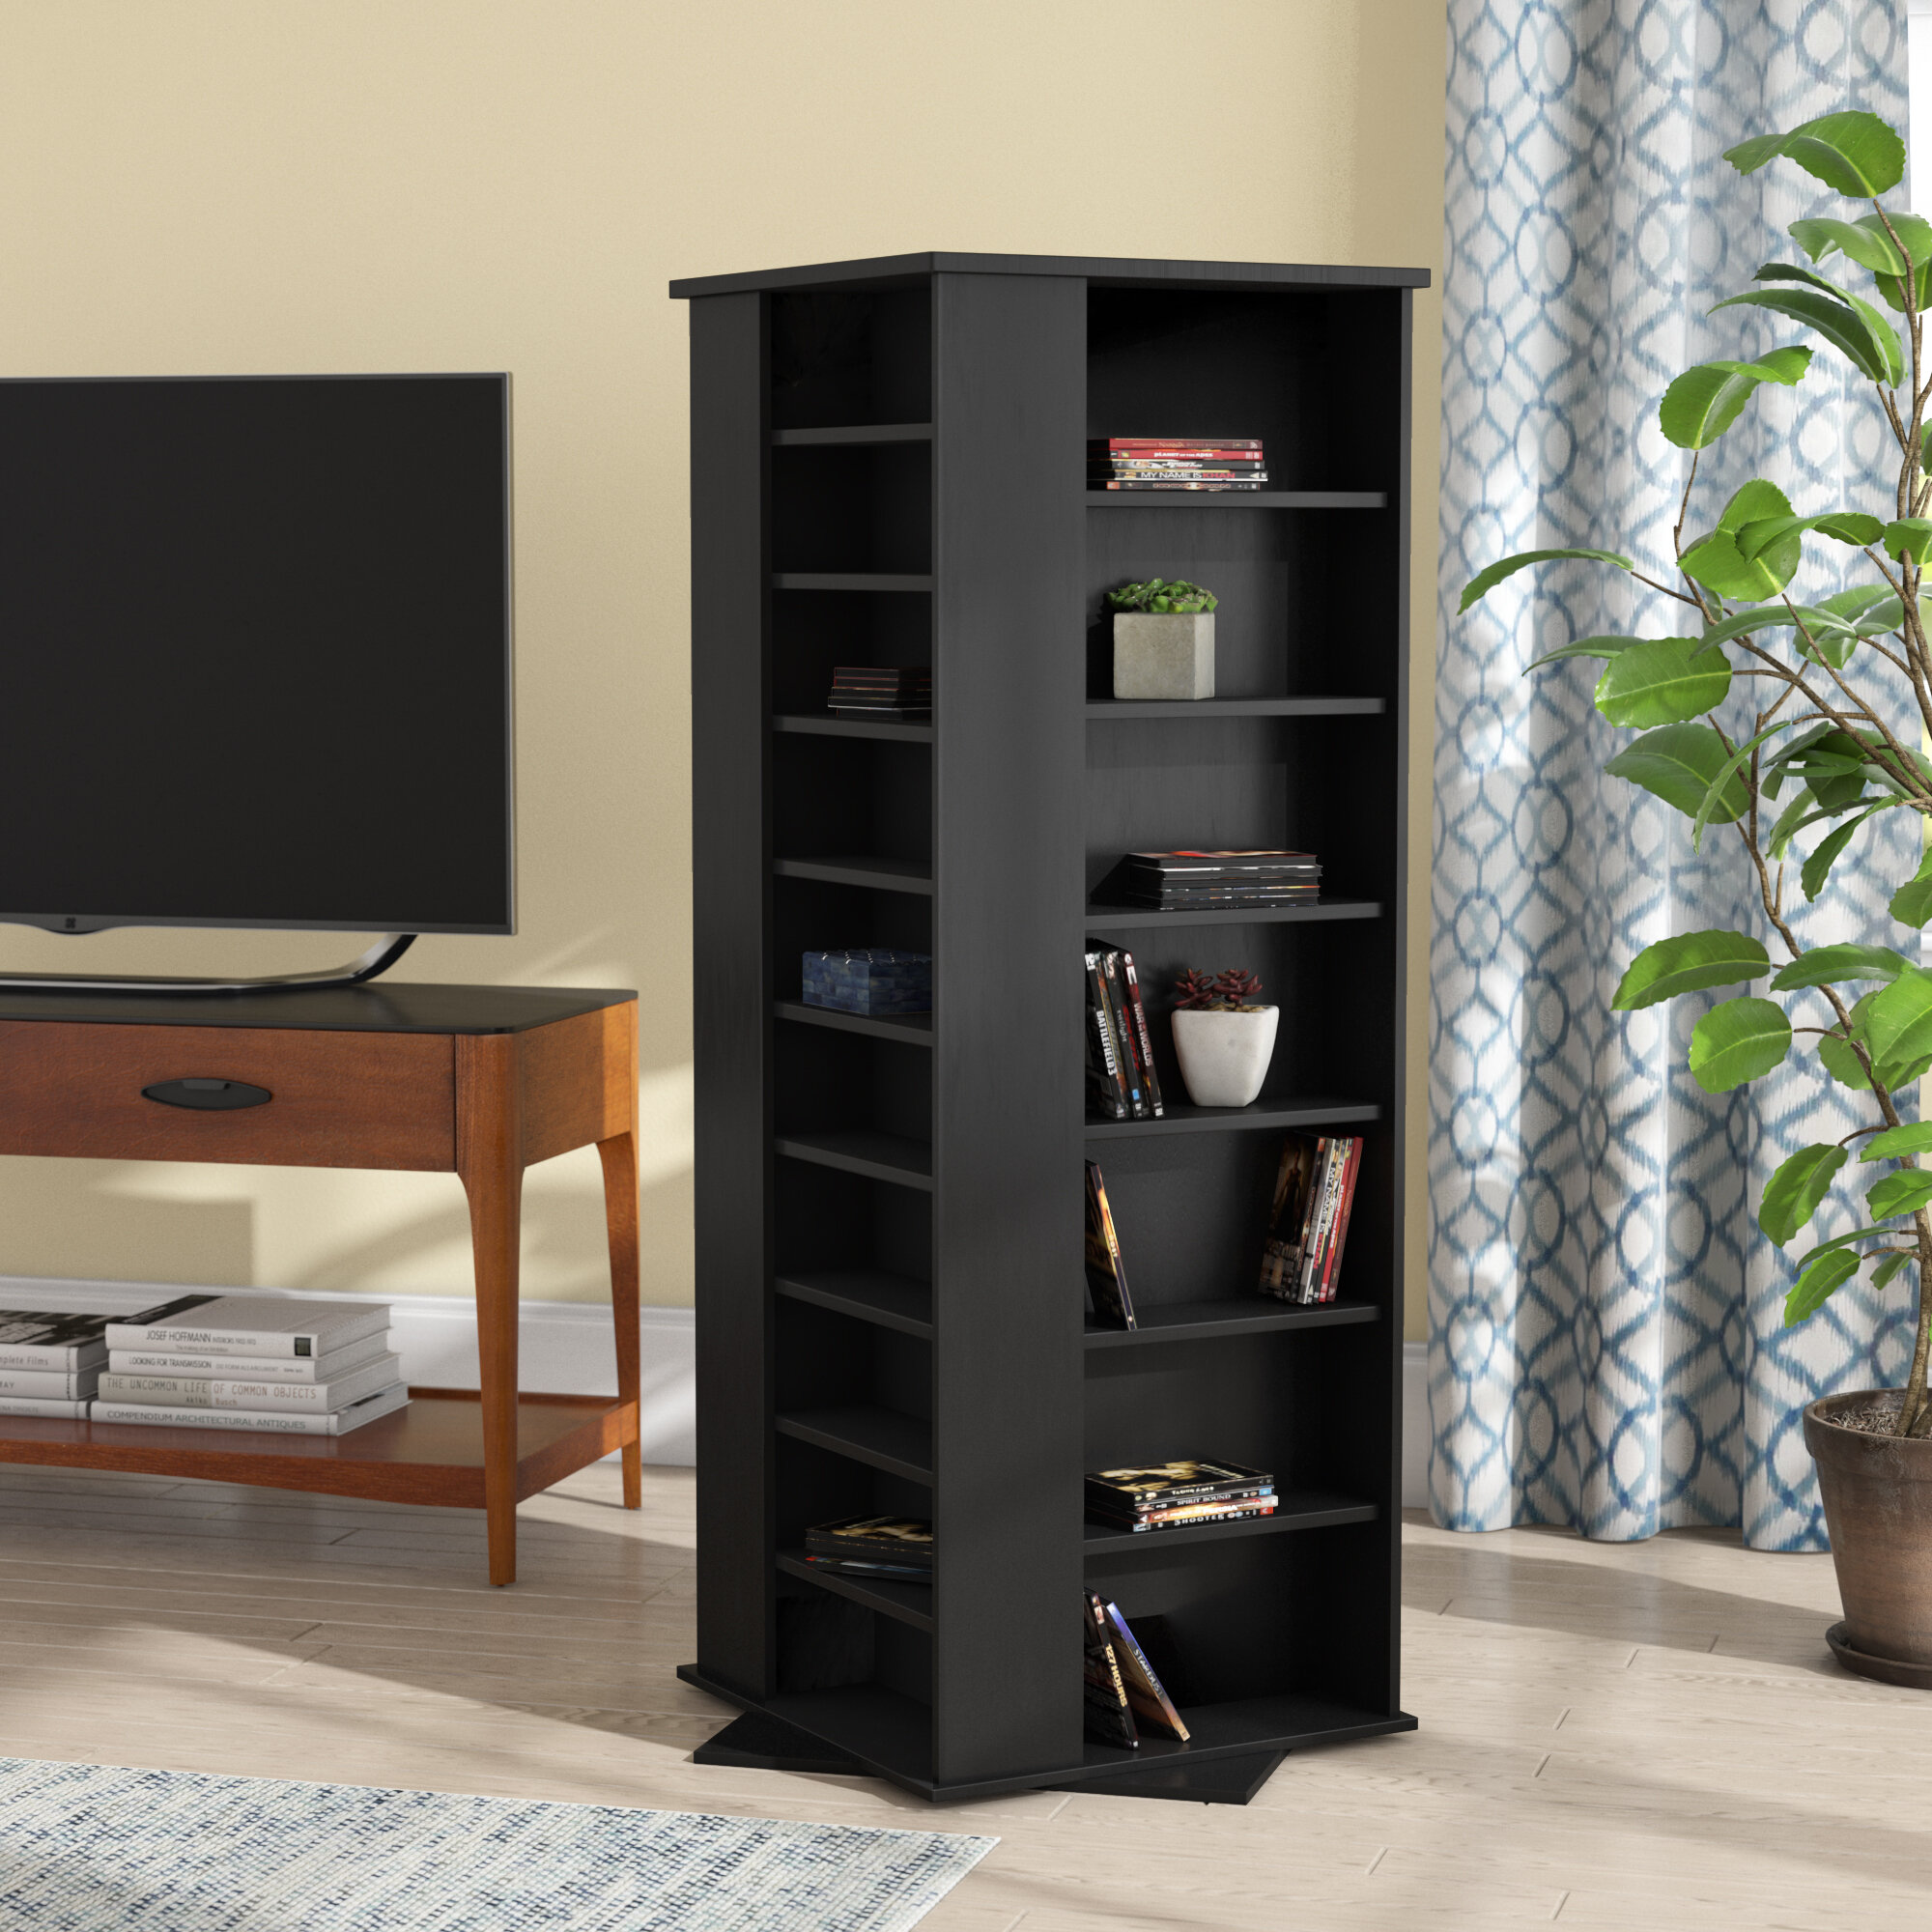 Rebrilliant 1600 CD Molded Multimedia Revolving Tower U0026 Reviews | Wayfair